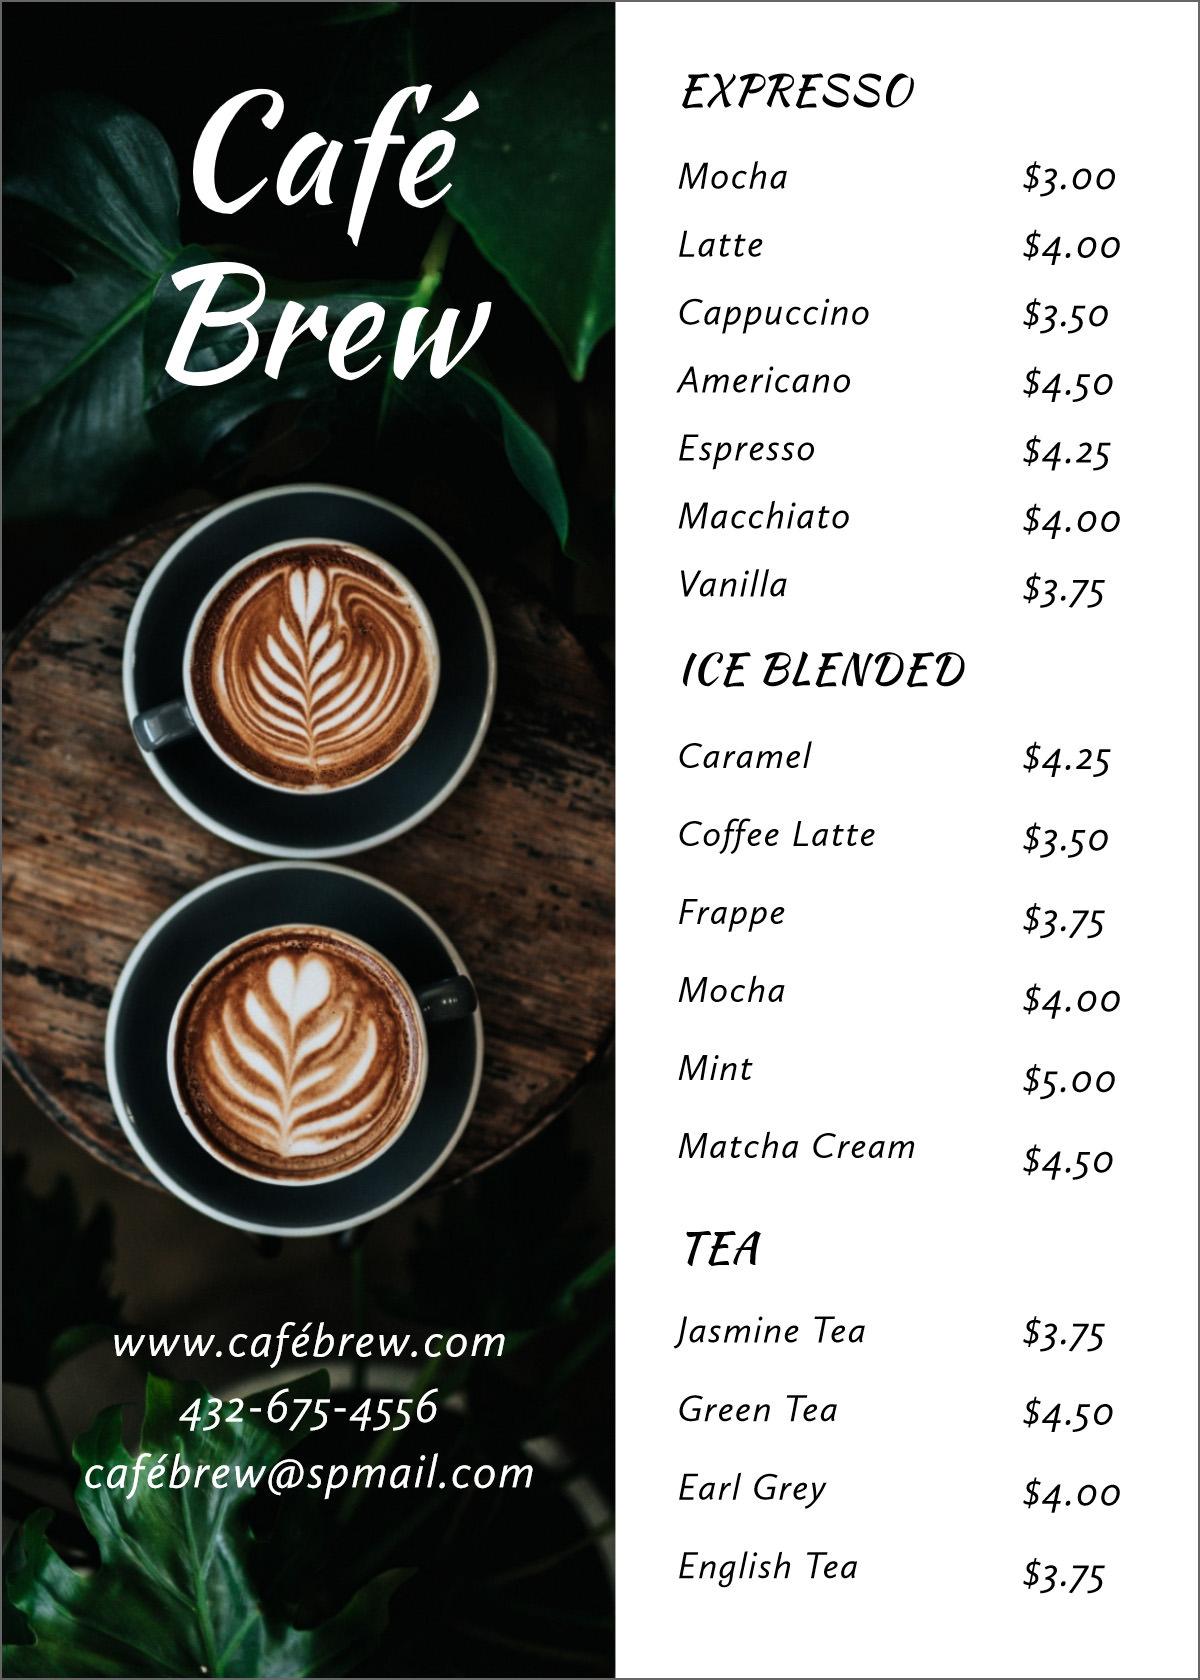 21 Free Simple Menu Templates For Restaurants, Cafes, And Parties Inside Free Cafe Menu Templates For Word